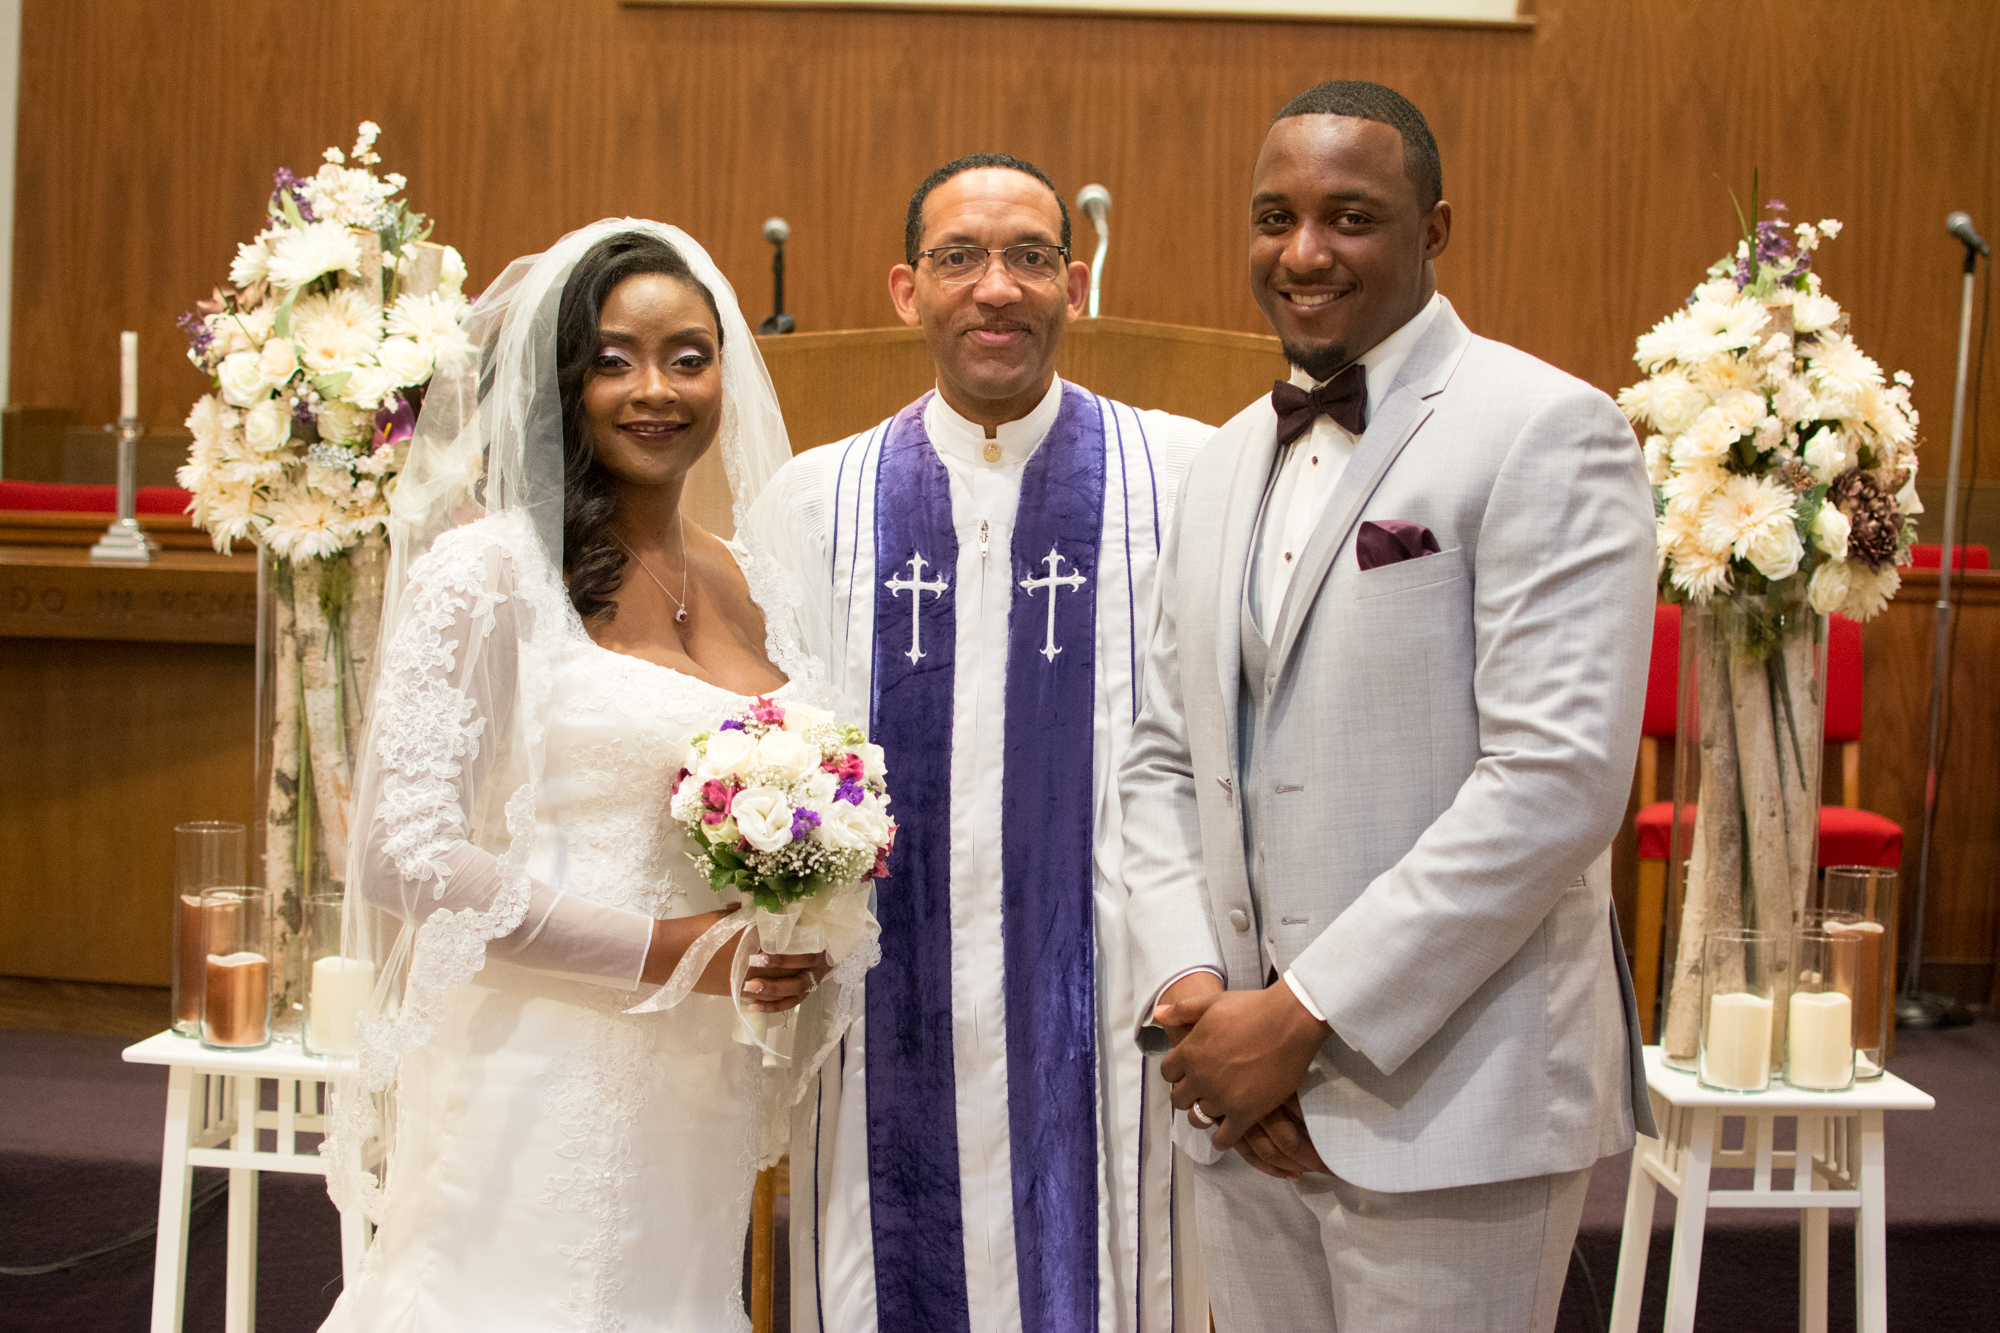 Murchison Wedding 2016.5.jpg